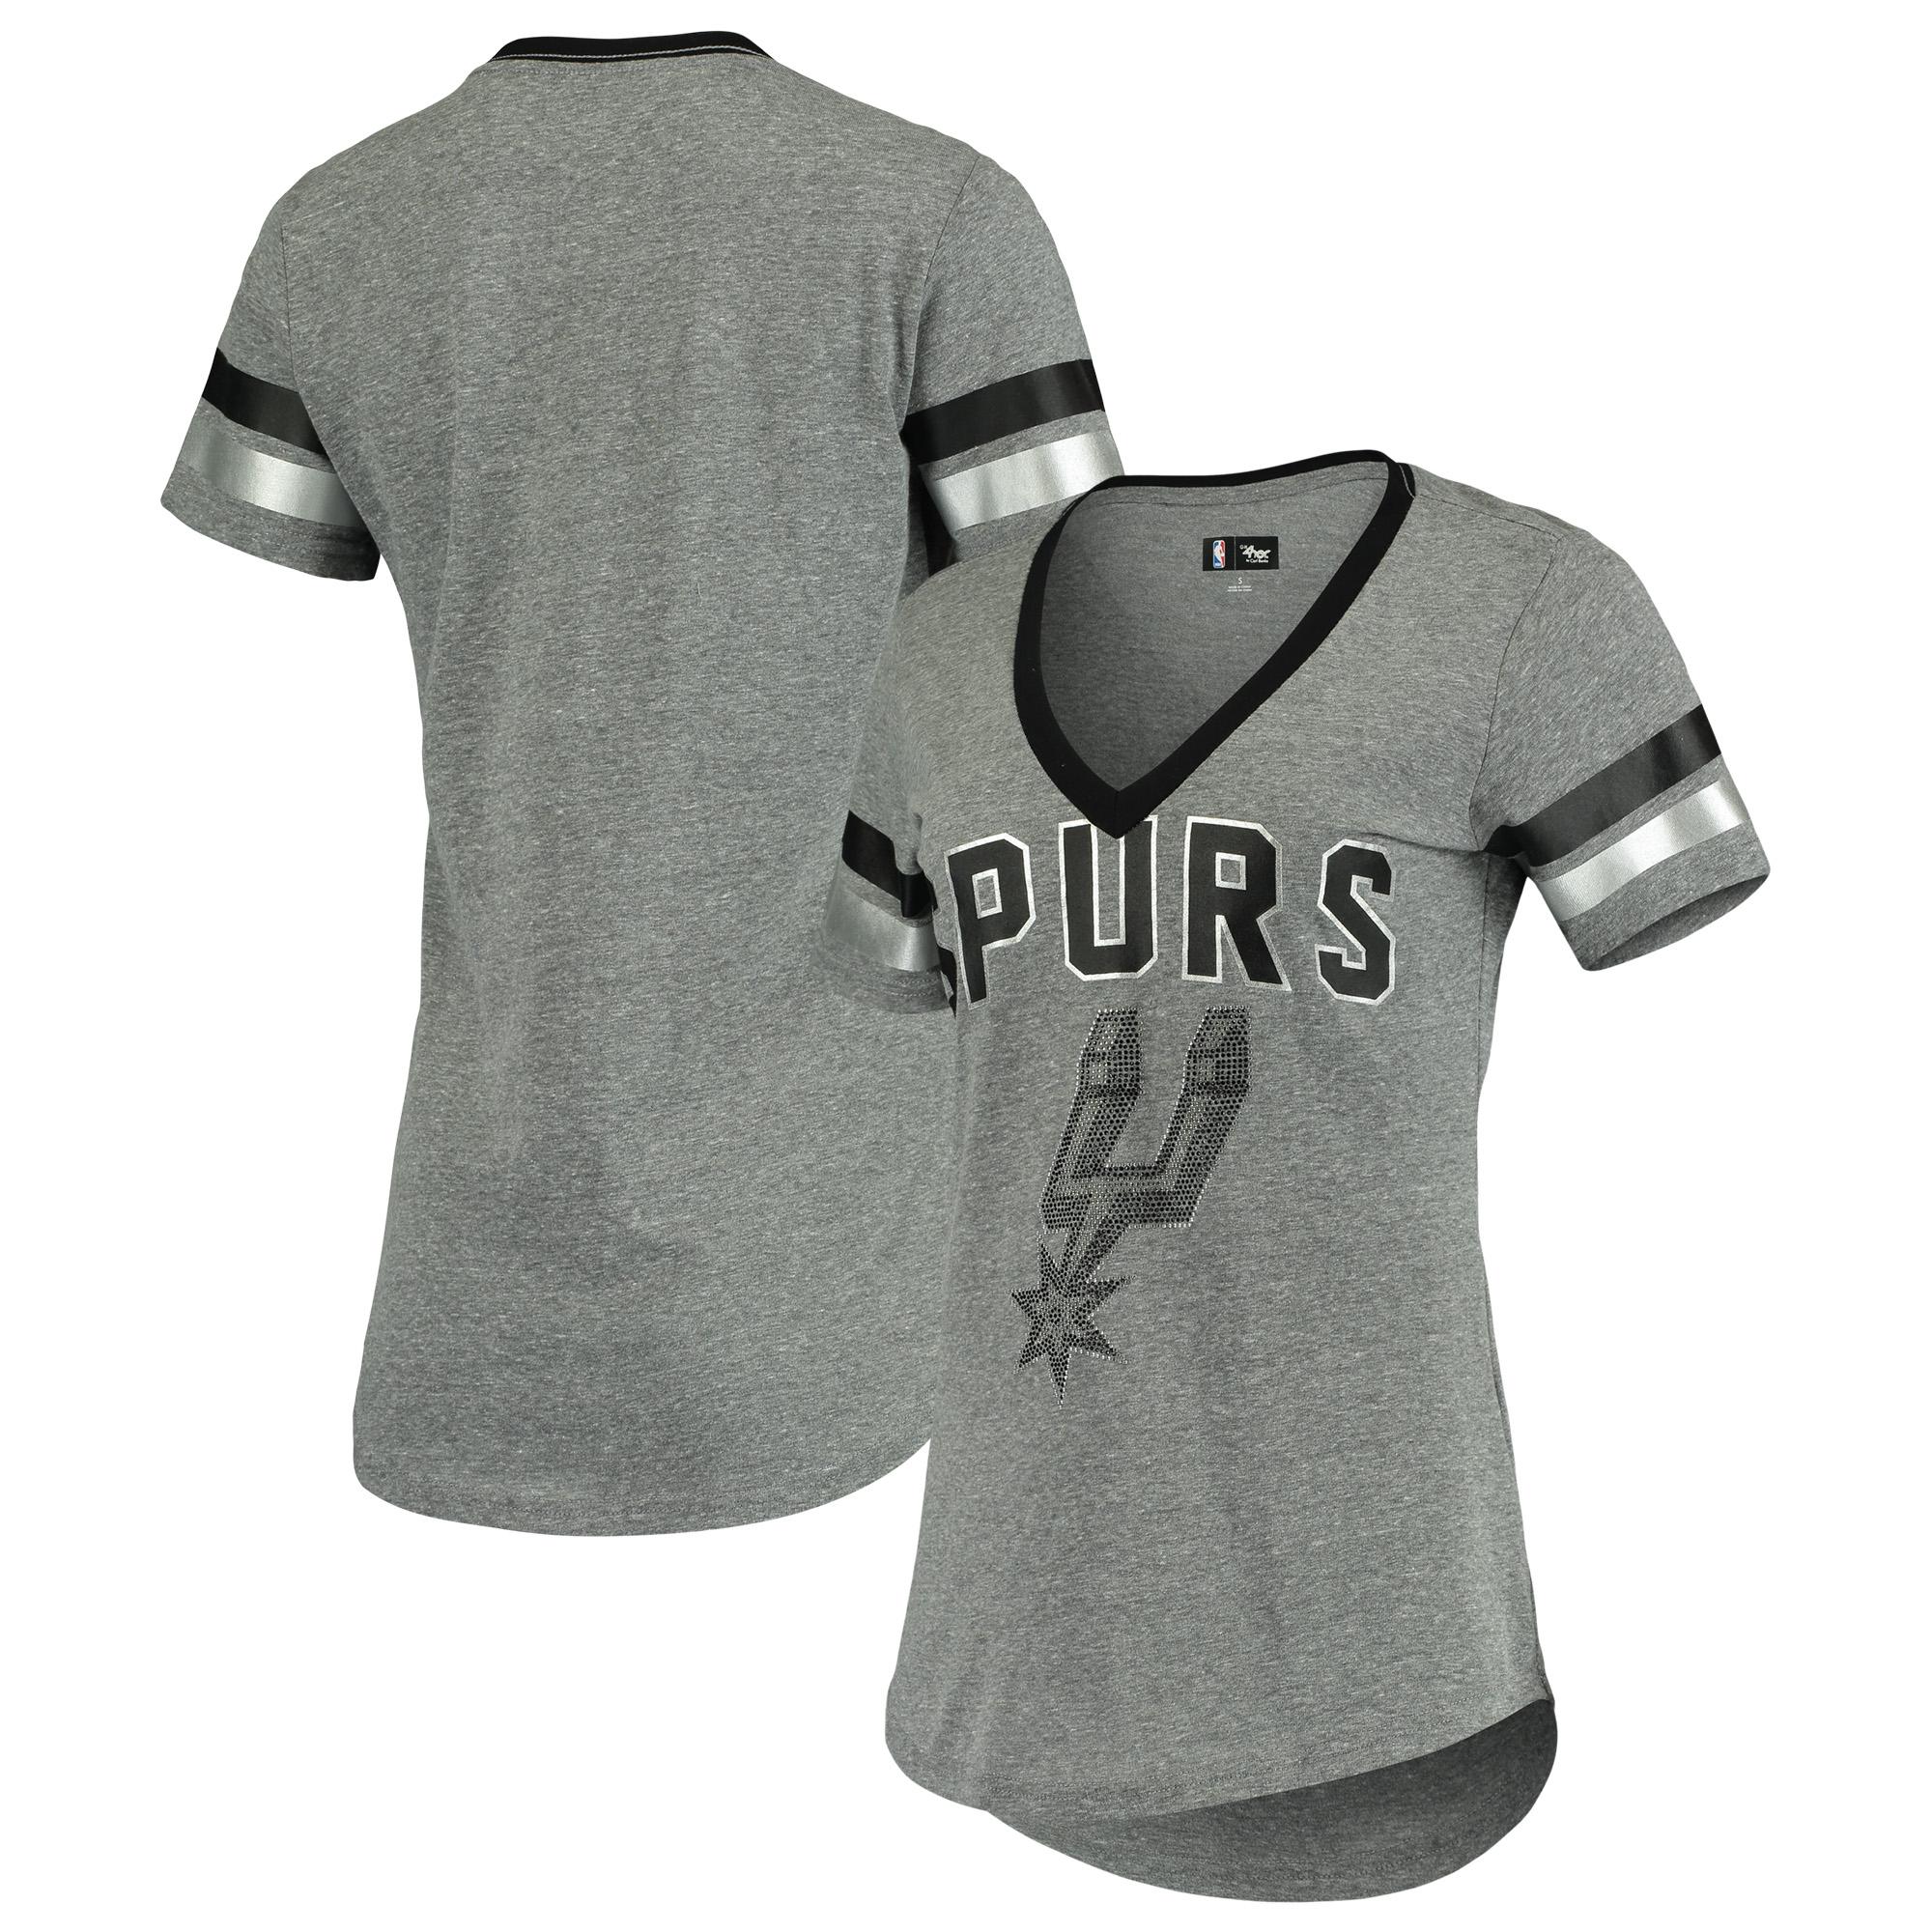 San Antonio Spurs G-III 4Her by Carl Banks Women's Walk Off Crystal Applique Logo V-Neck Tri-Blend T-Shirt - Gray/Black